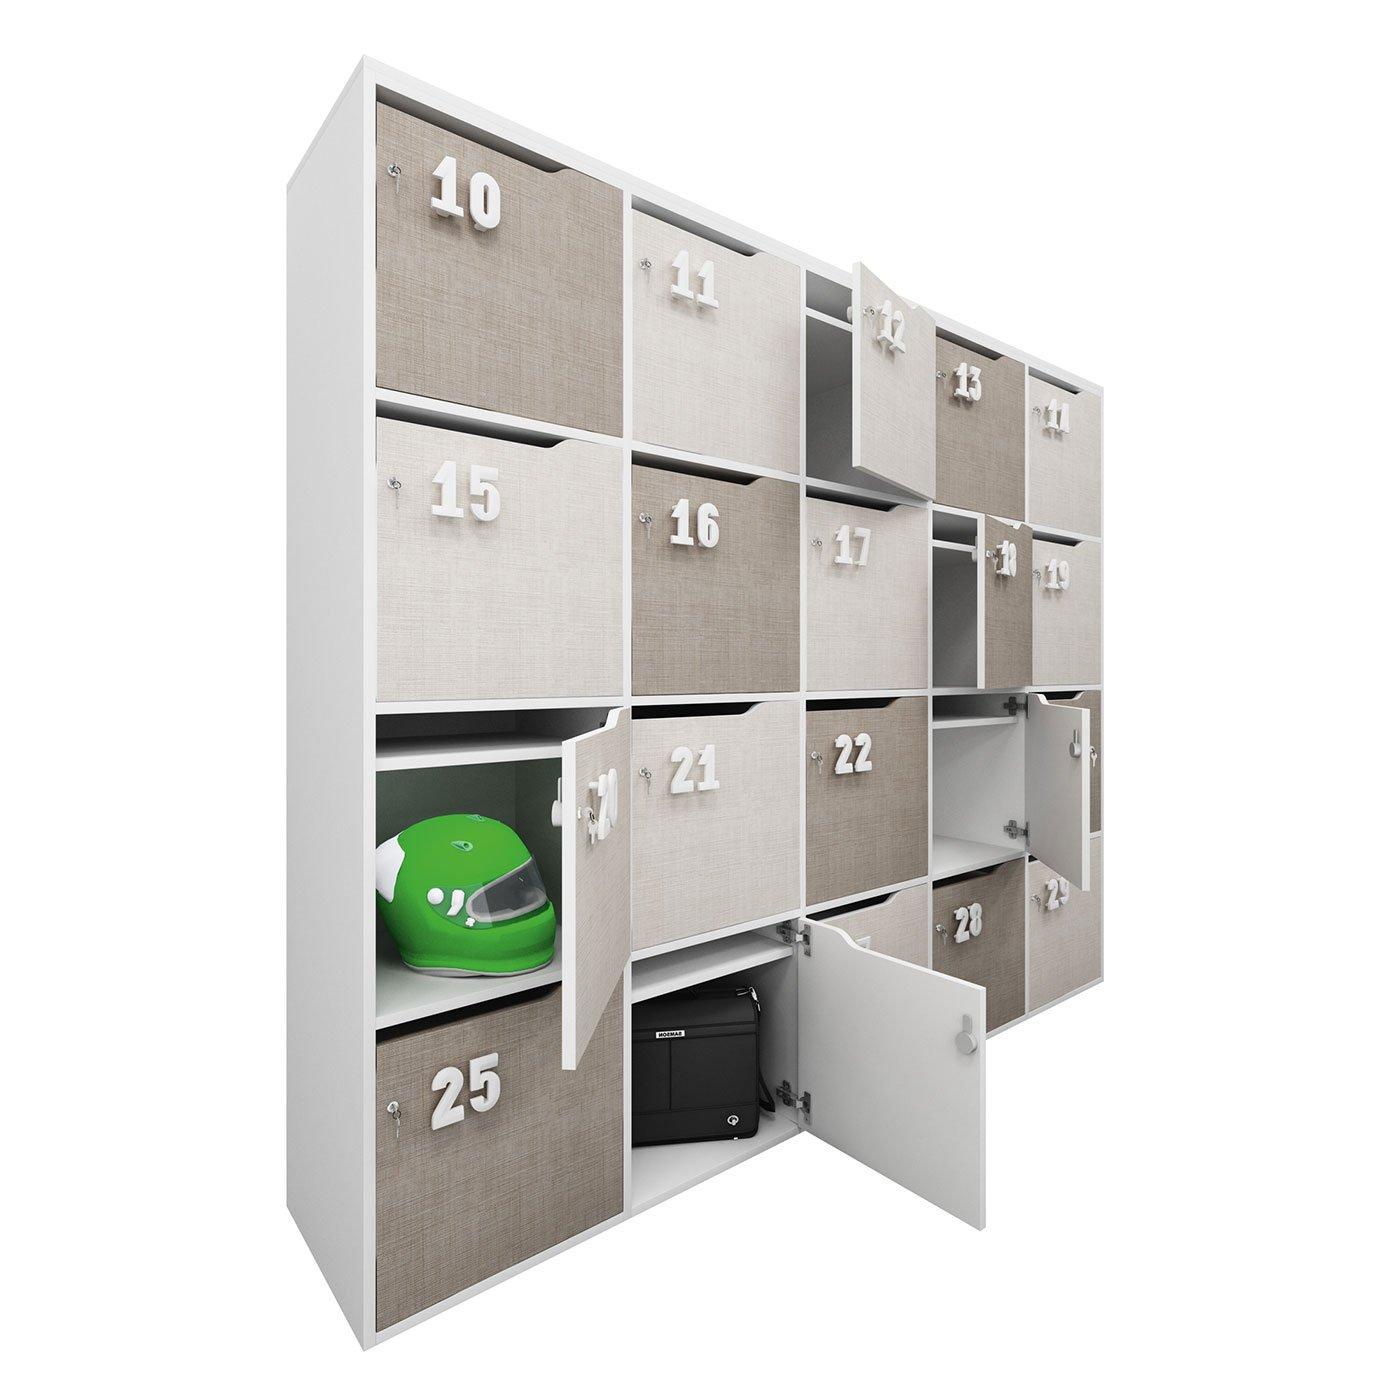 Pratik mobili operativi arredamento ufficio for Smart arredo